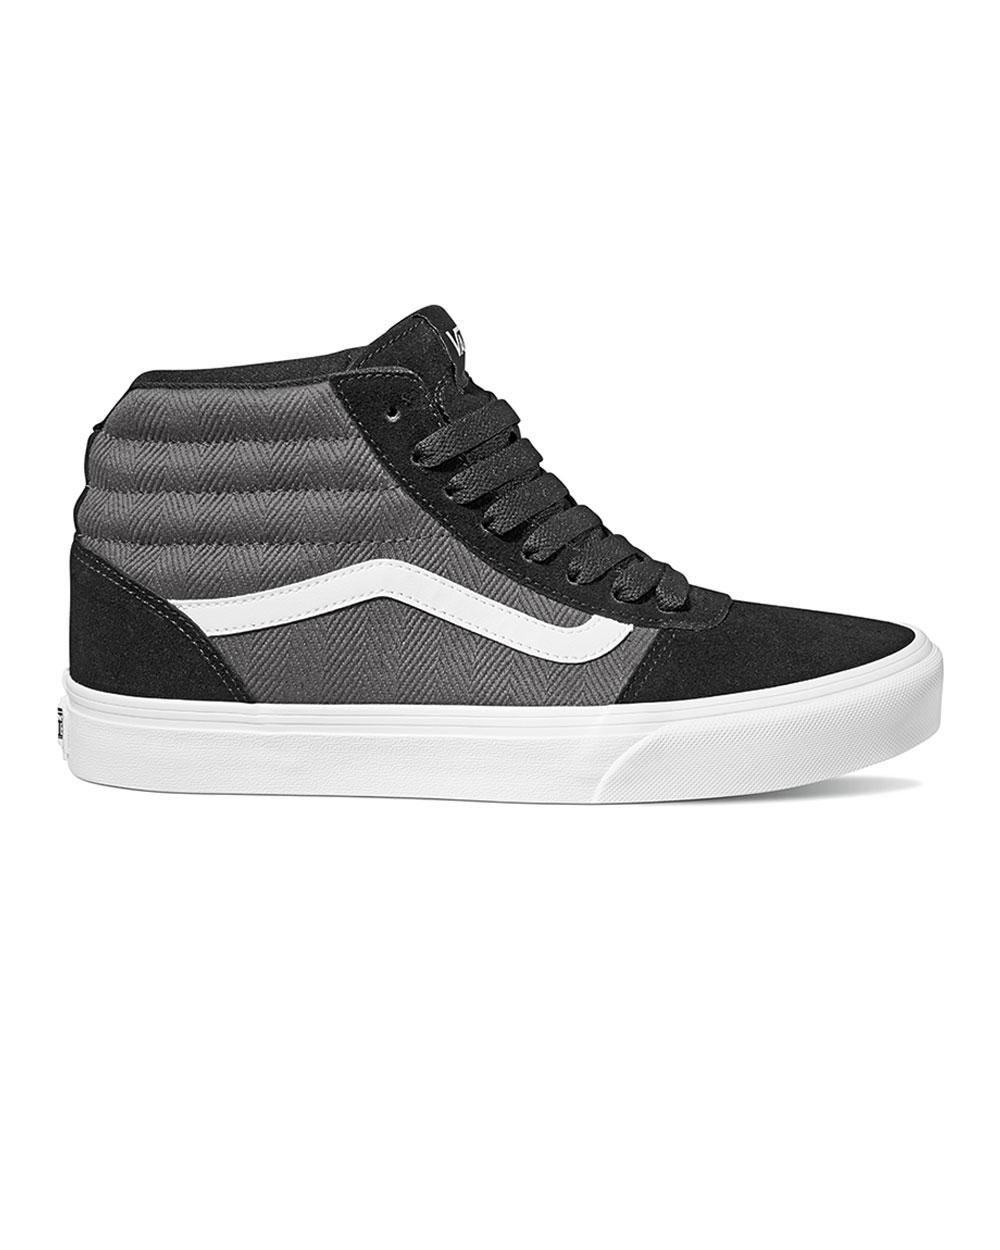 Vans Ward Hi Herringbone (black/grey